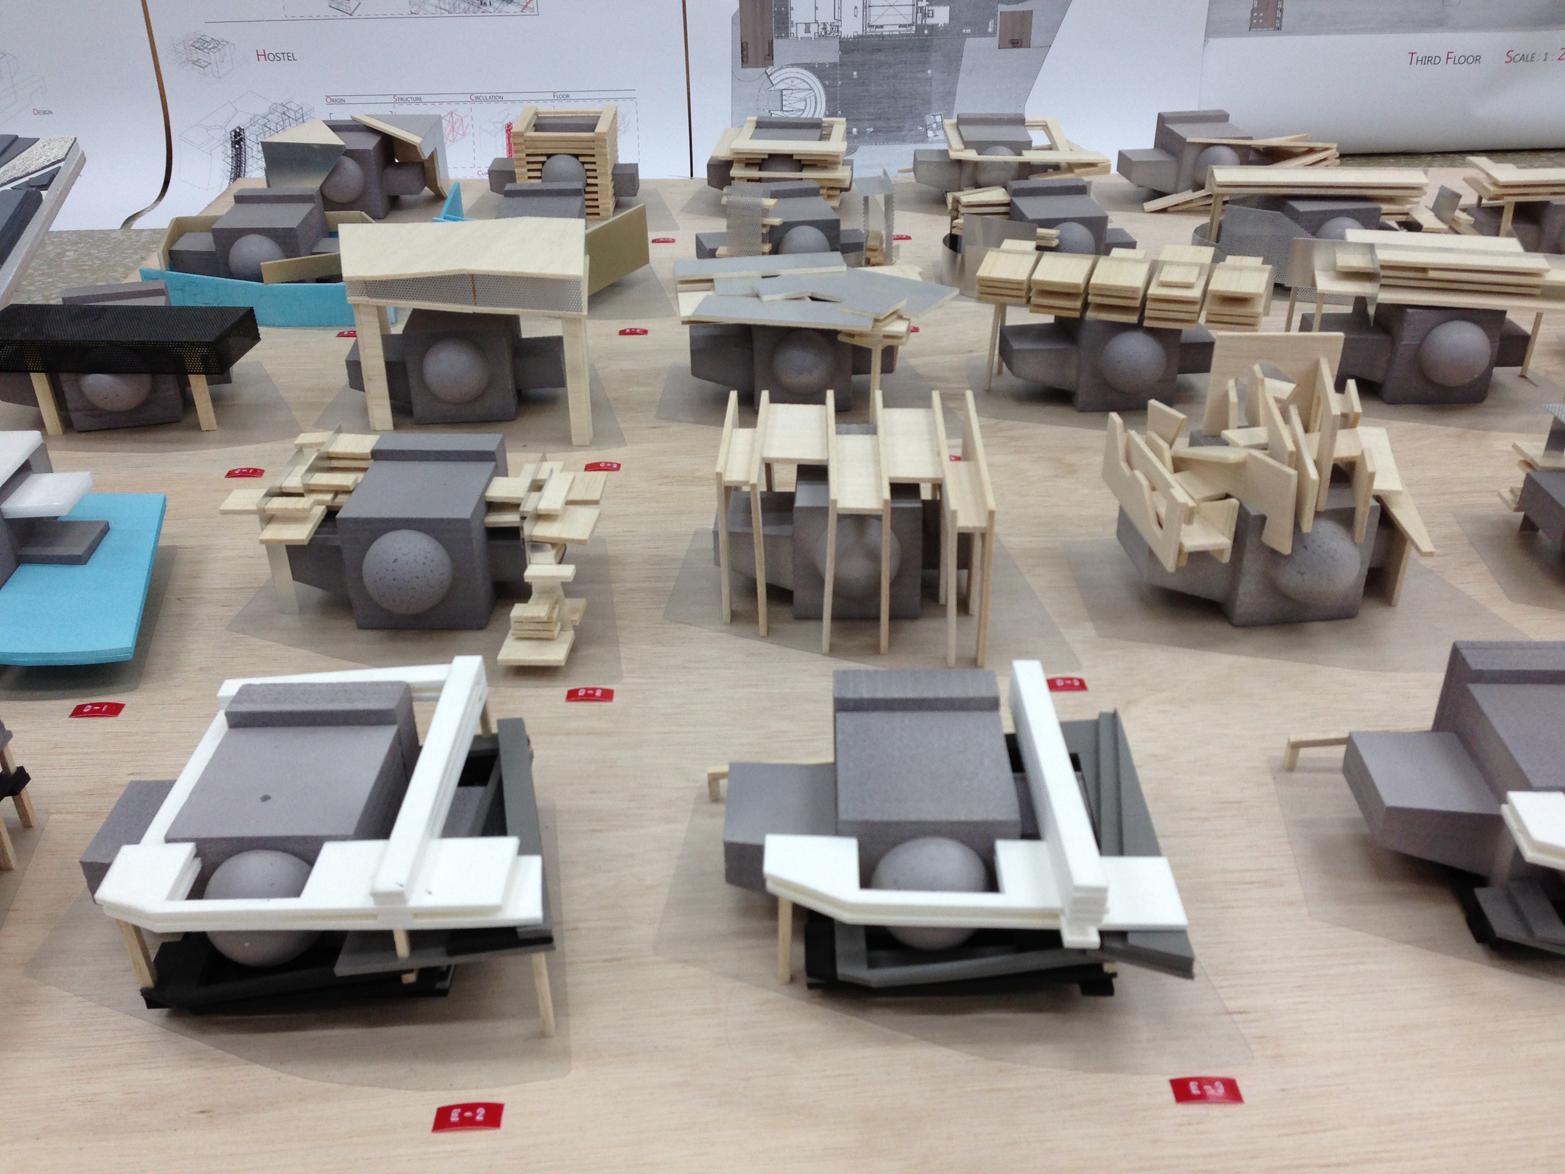 Architects make prototypes to explore many alternative form factors before deciding on a direction (photo courtesy of Flickr user Forgemind Archimedia)